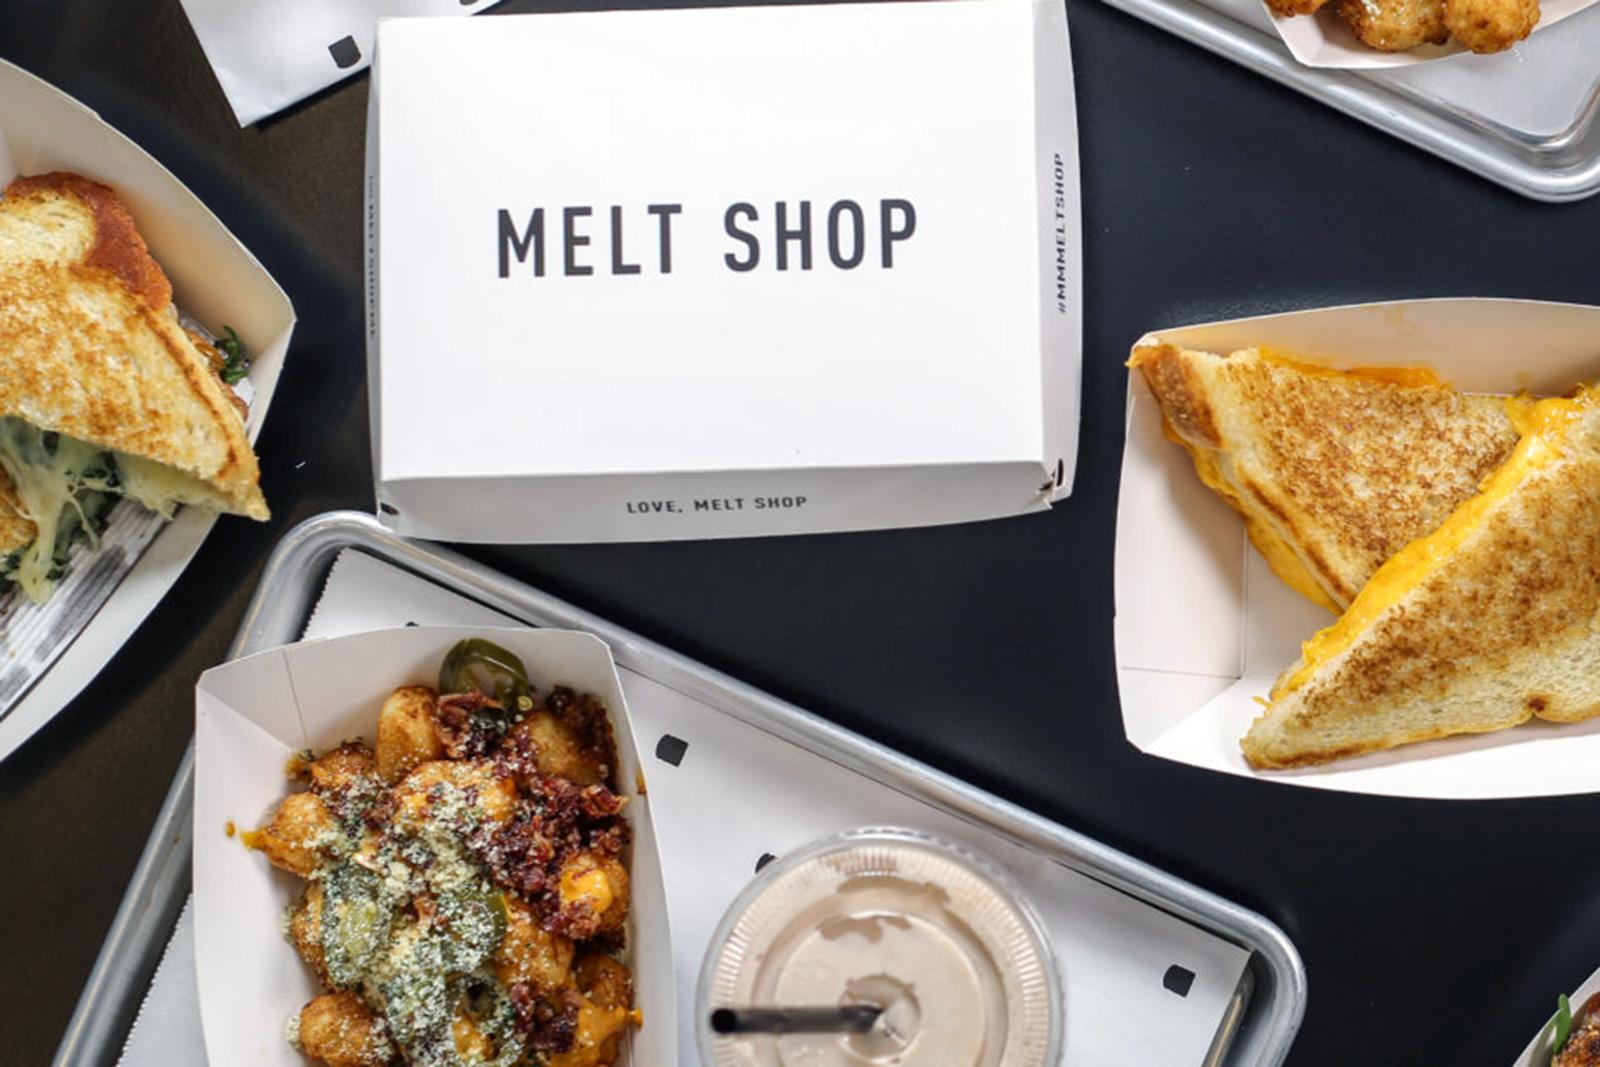 07_Melt Shop.jpg